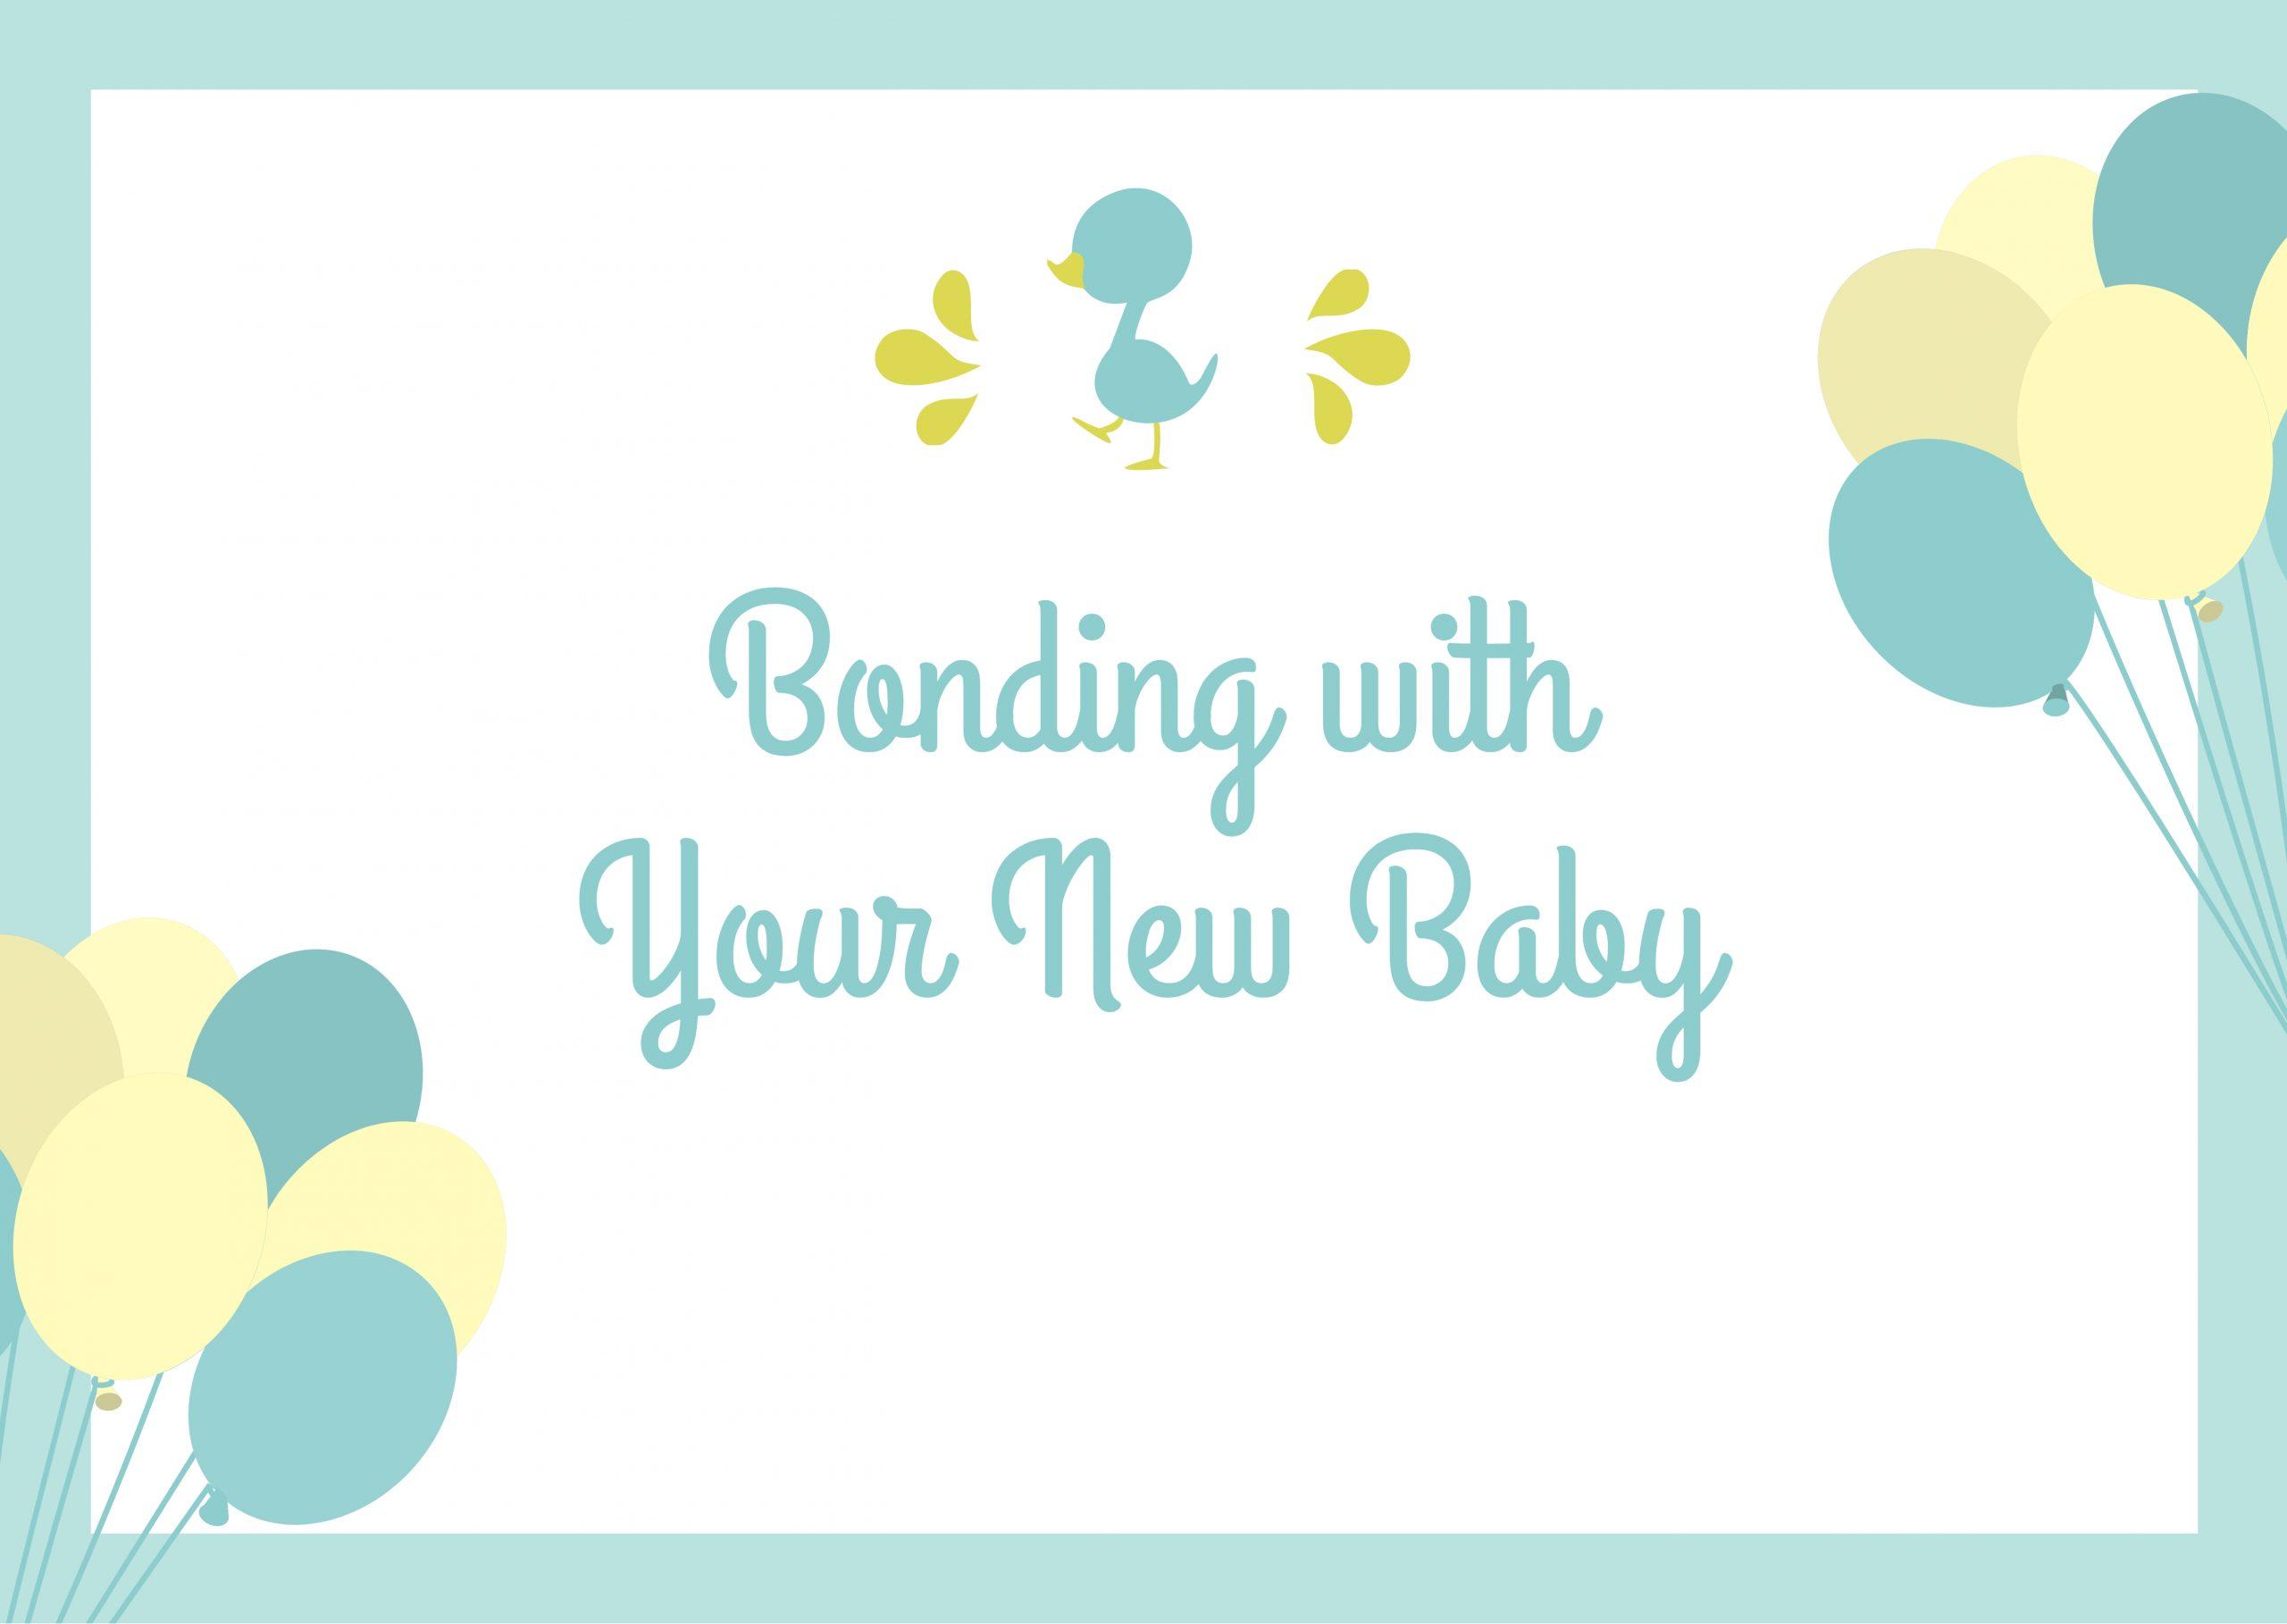 bonding with your newborn baby